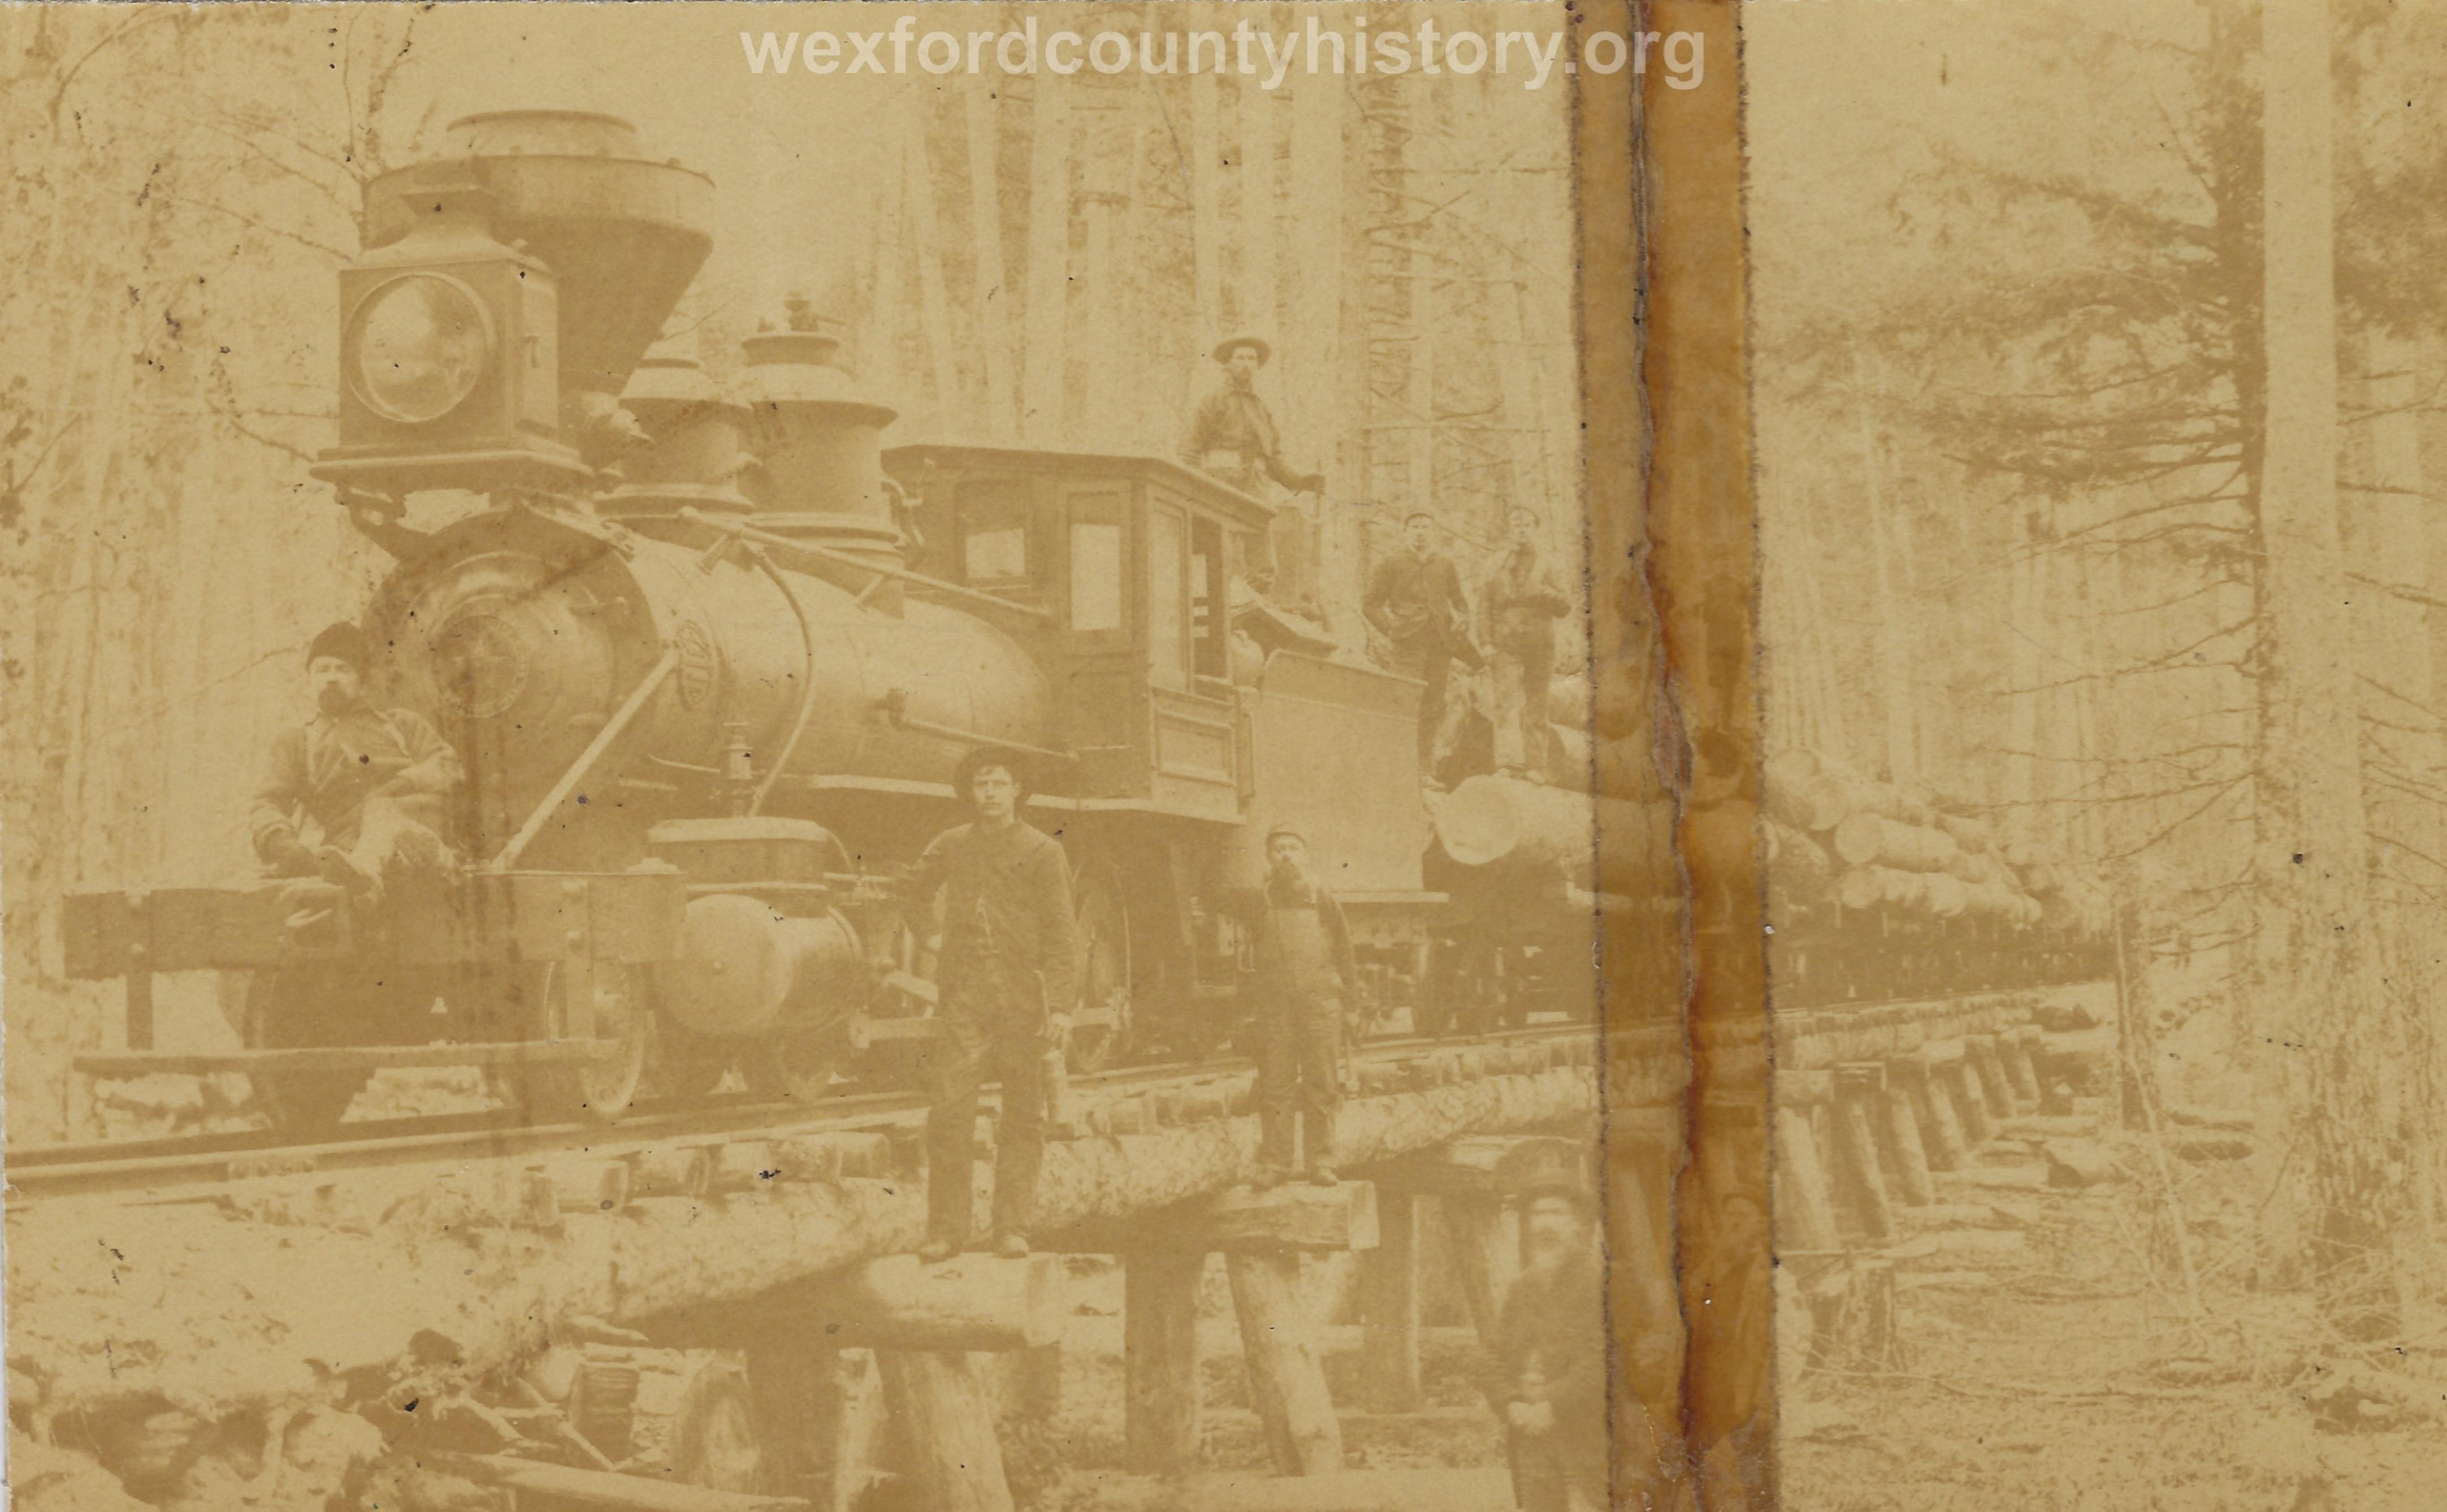 Cadillac-Lumber-Locomotive-Passing-On-Wooden-Bridge